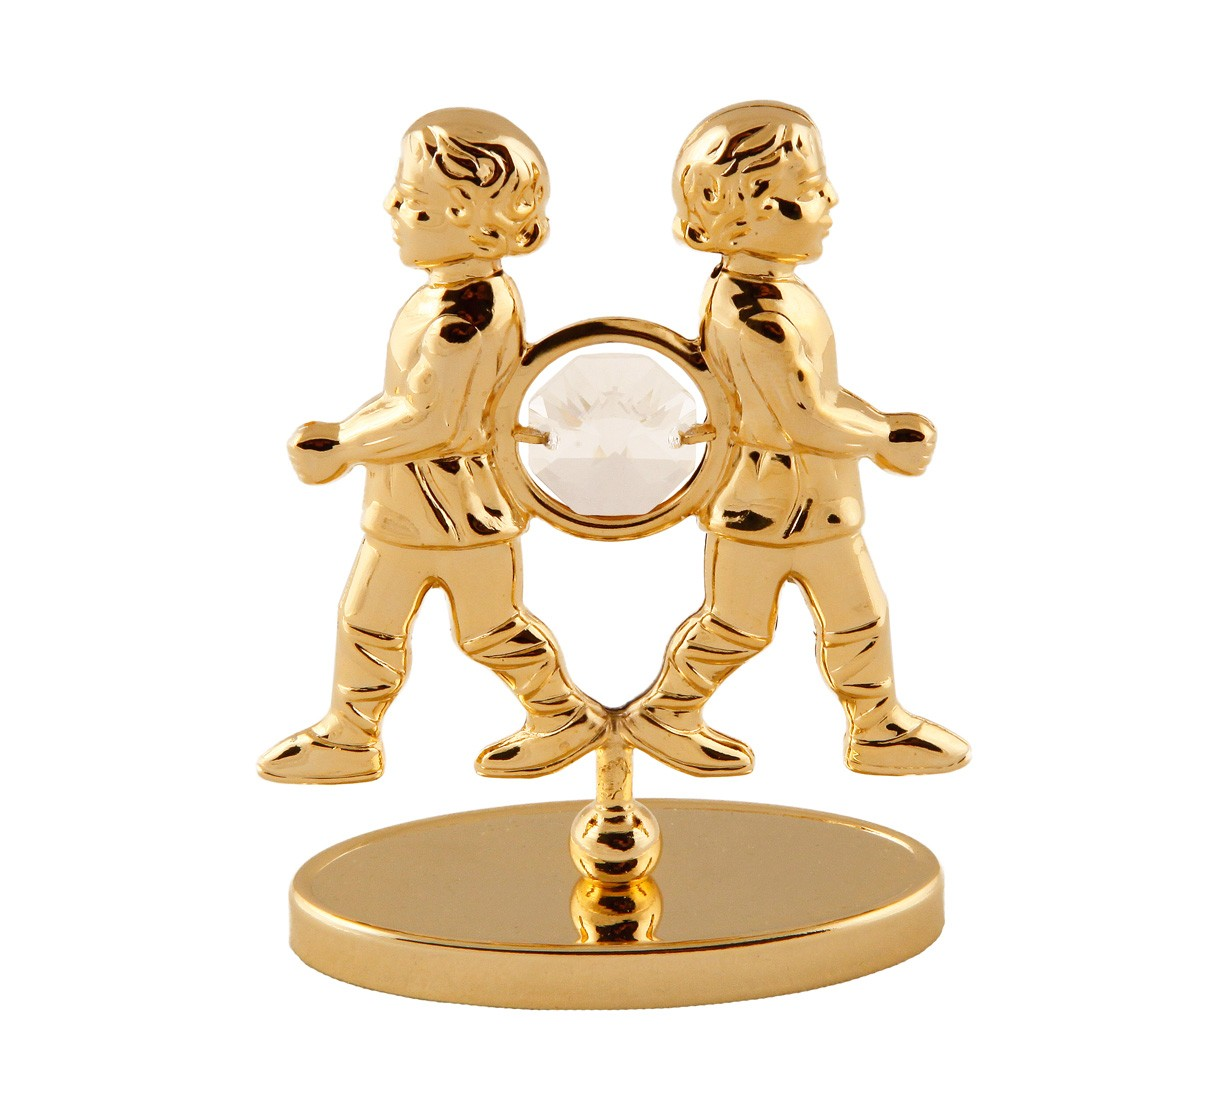 Gemeni pe stativ cu Cristale Swarovski - placat cu Aur 24K